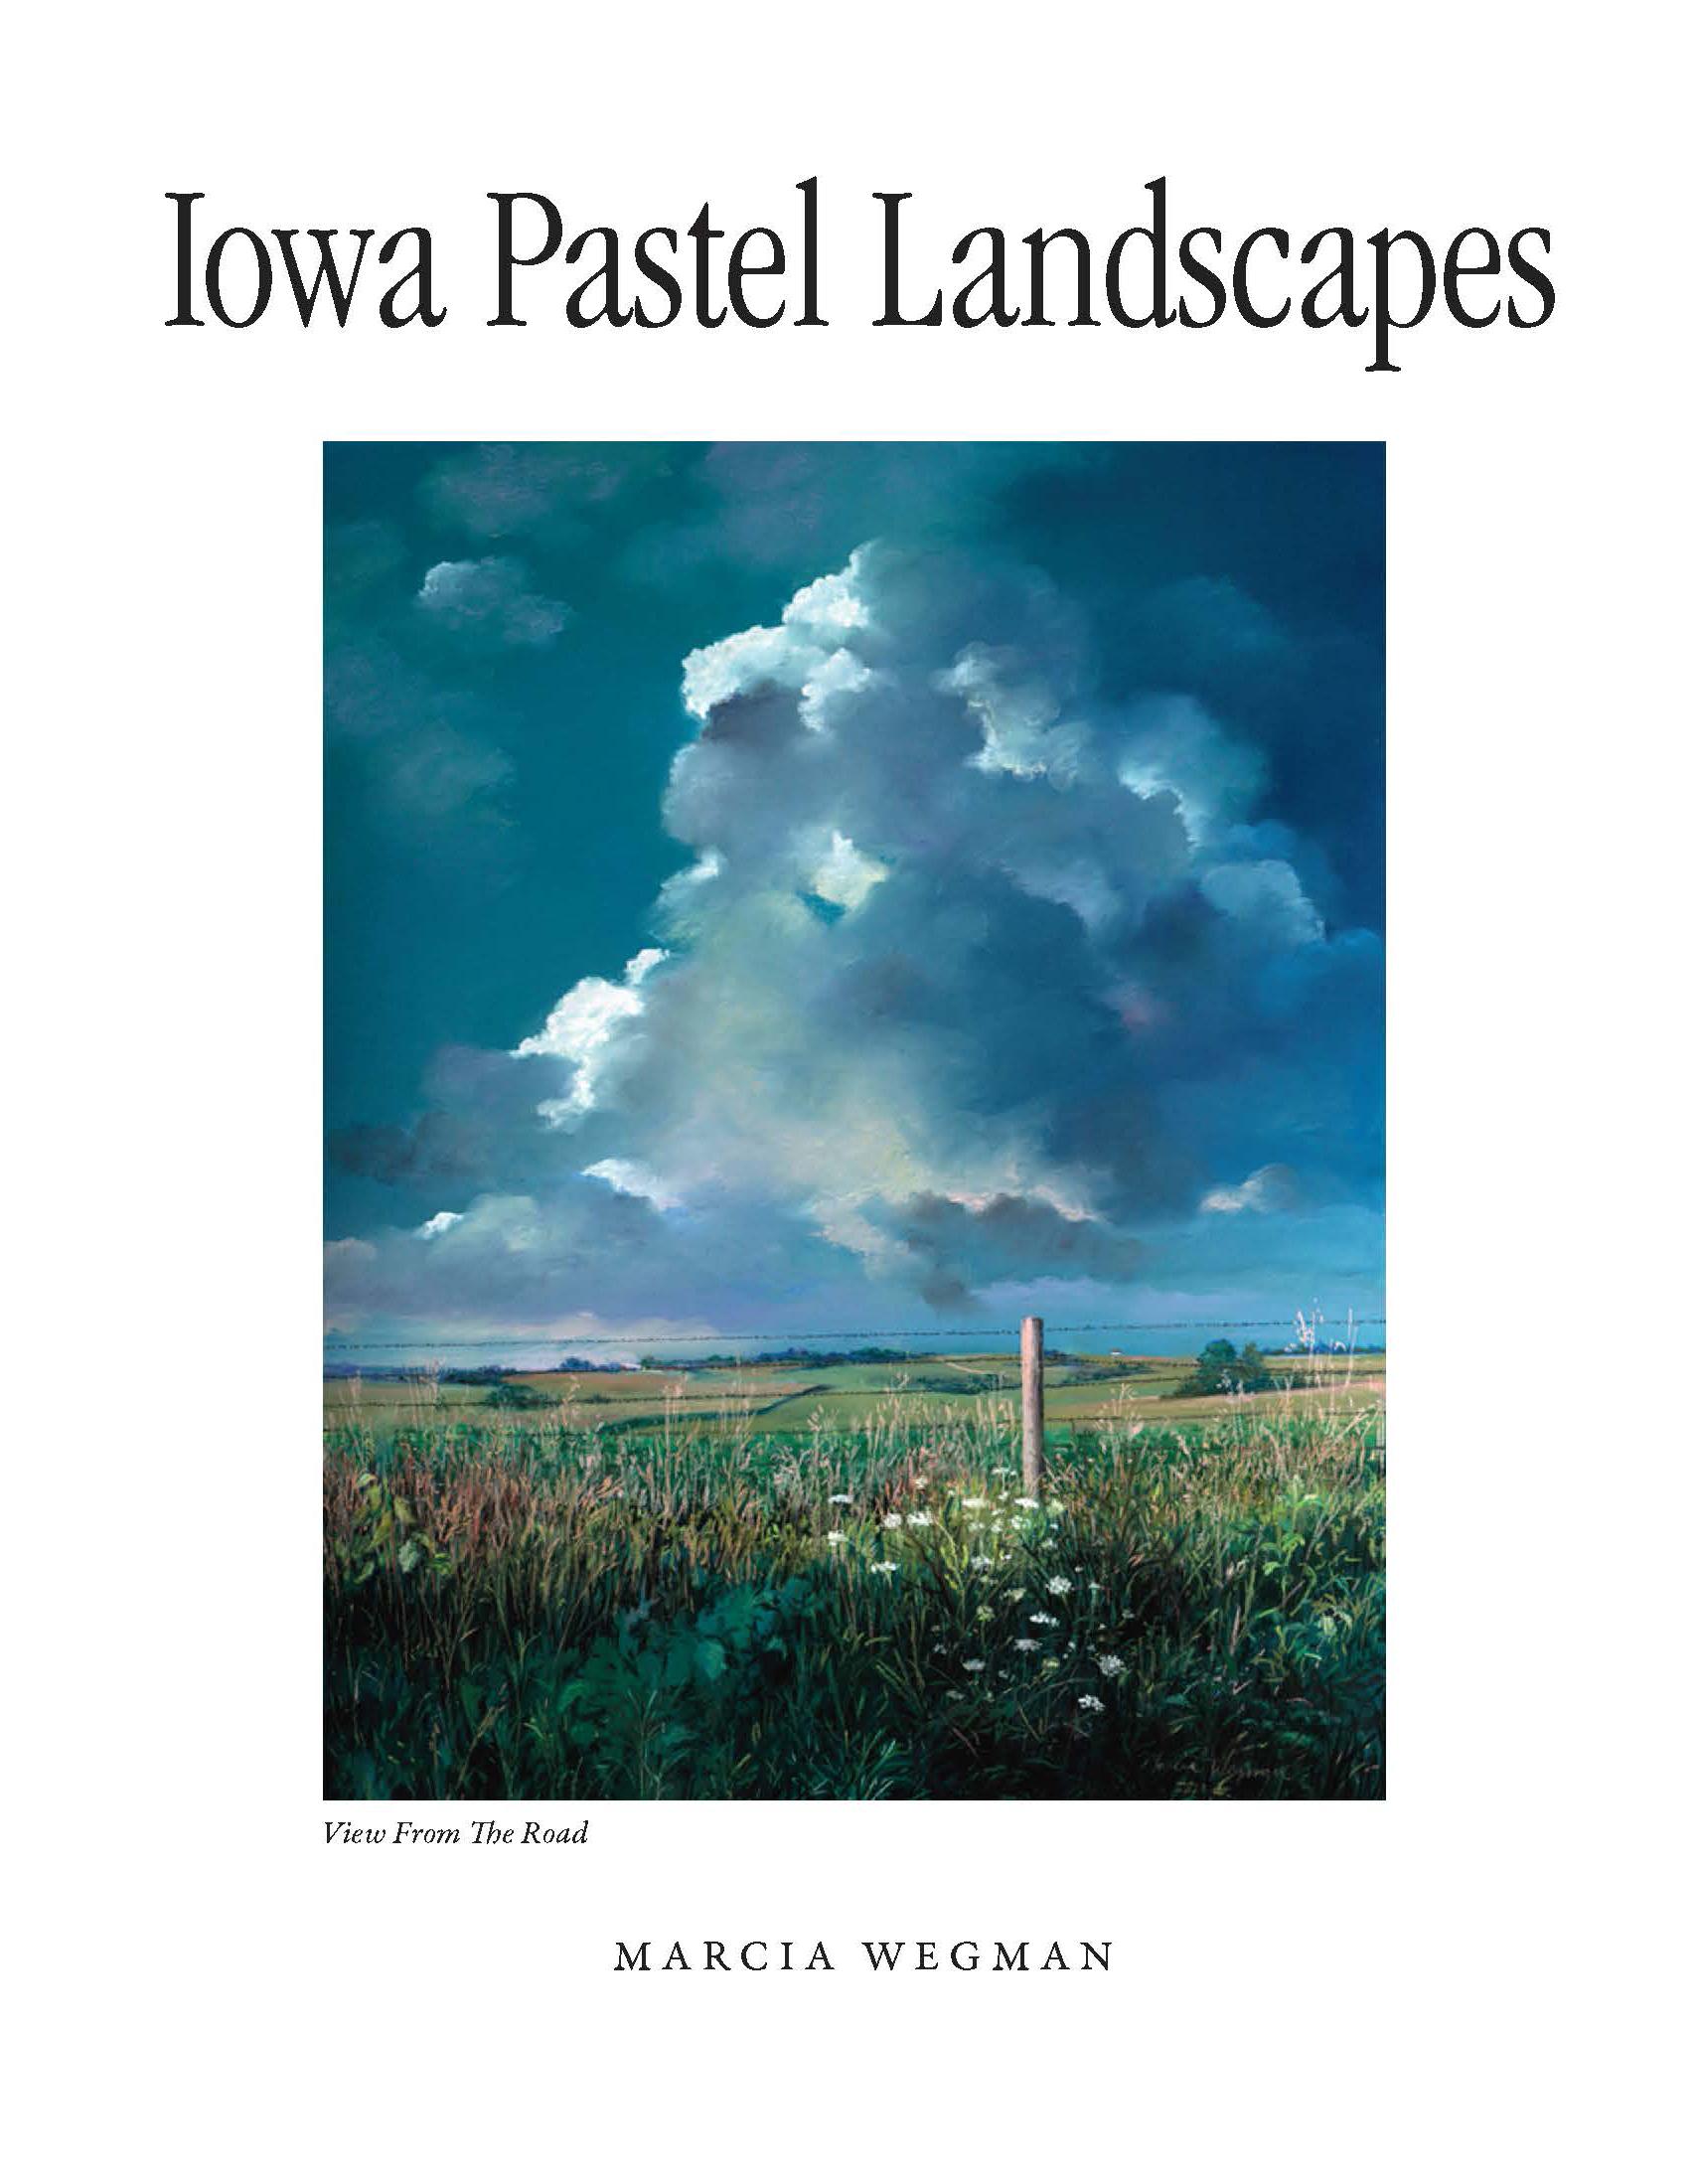 13-239 Iowa Pastel Landscapes Wegman front cover